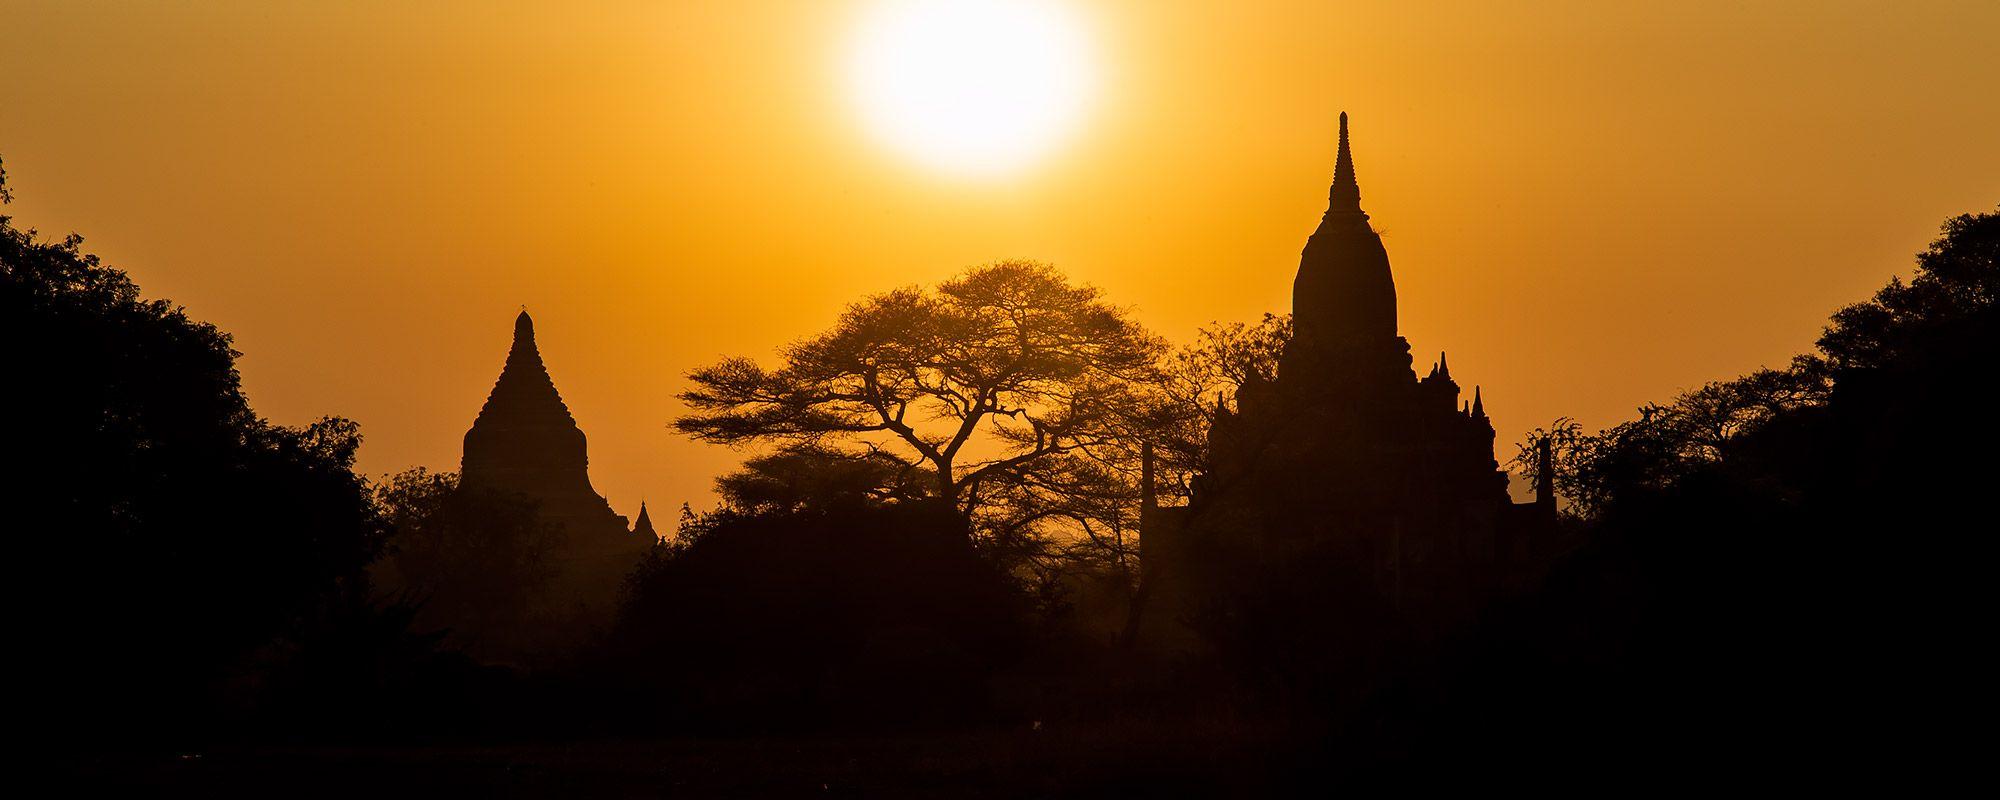 Sonnenuntergang mit Tempel in Bagan